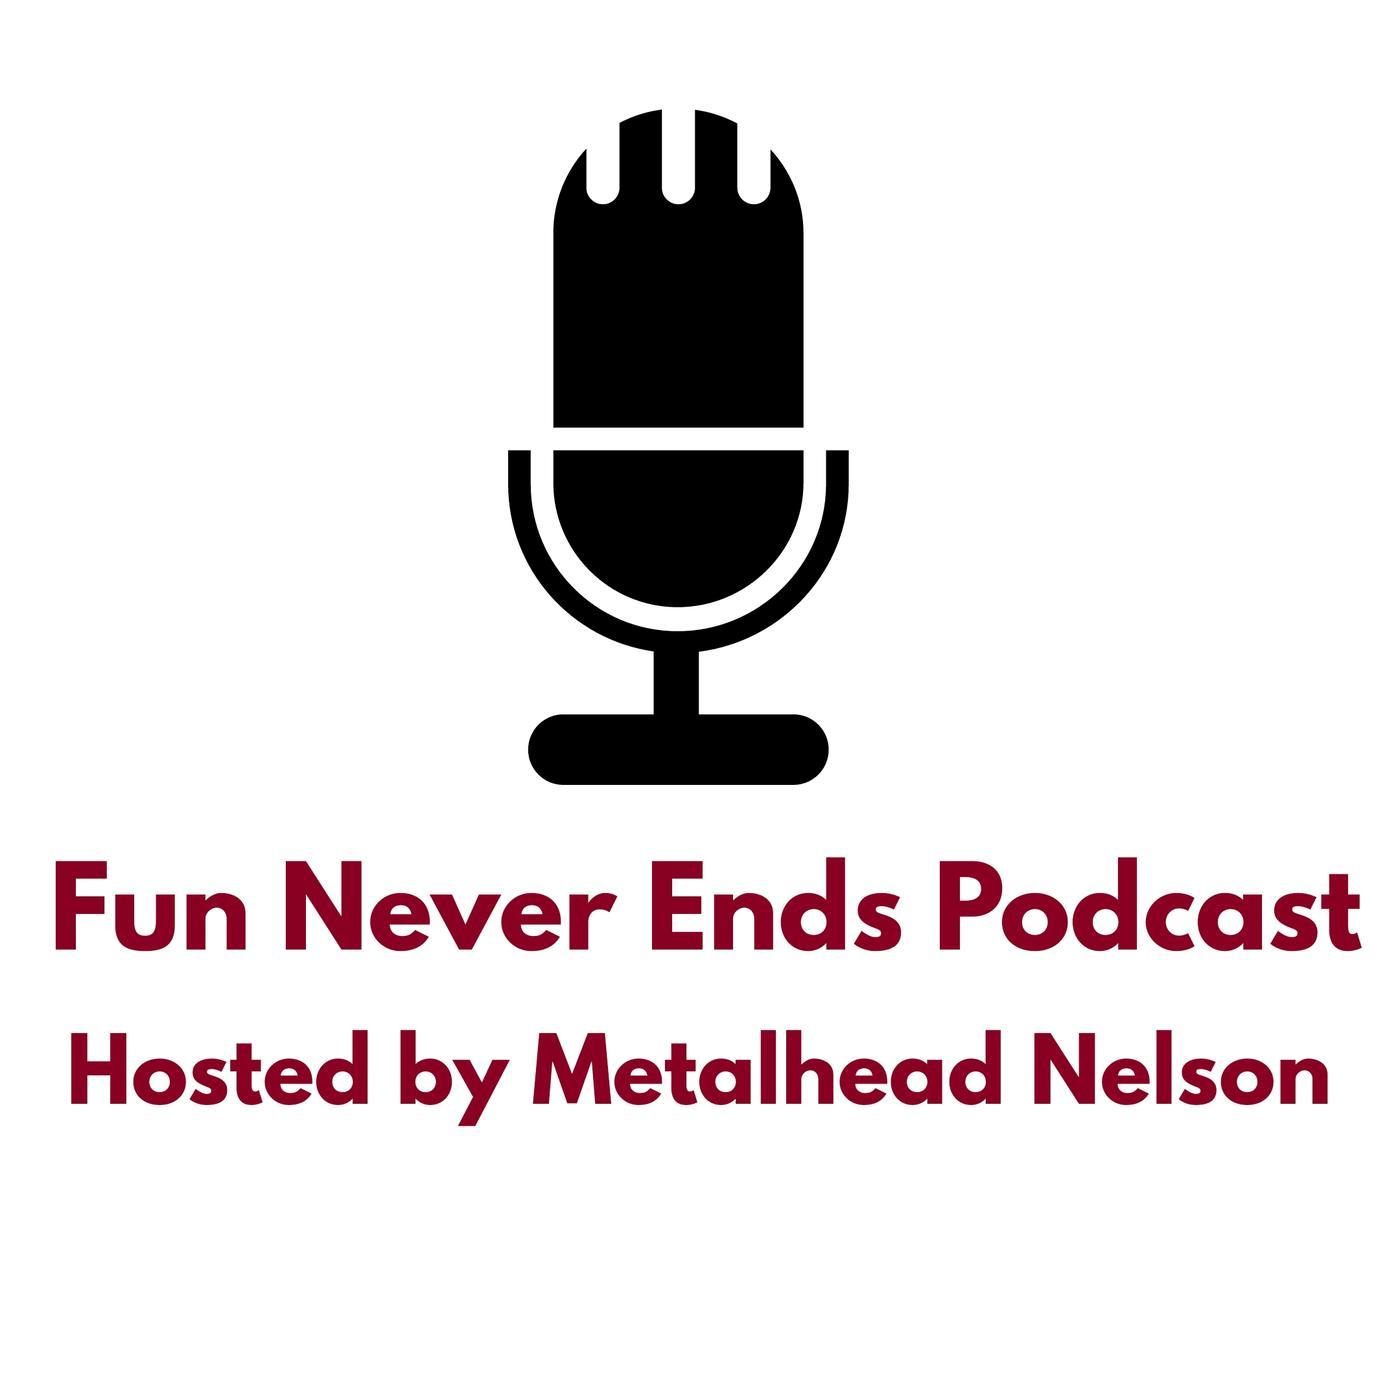 Online-Dating-Metalheads